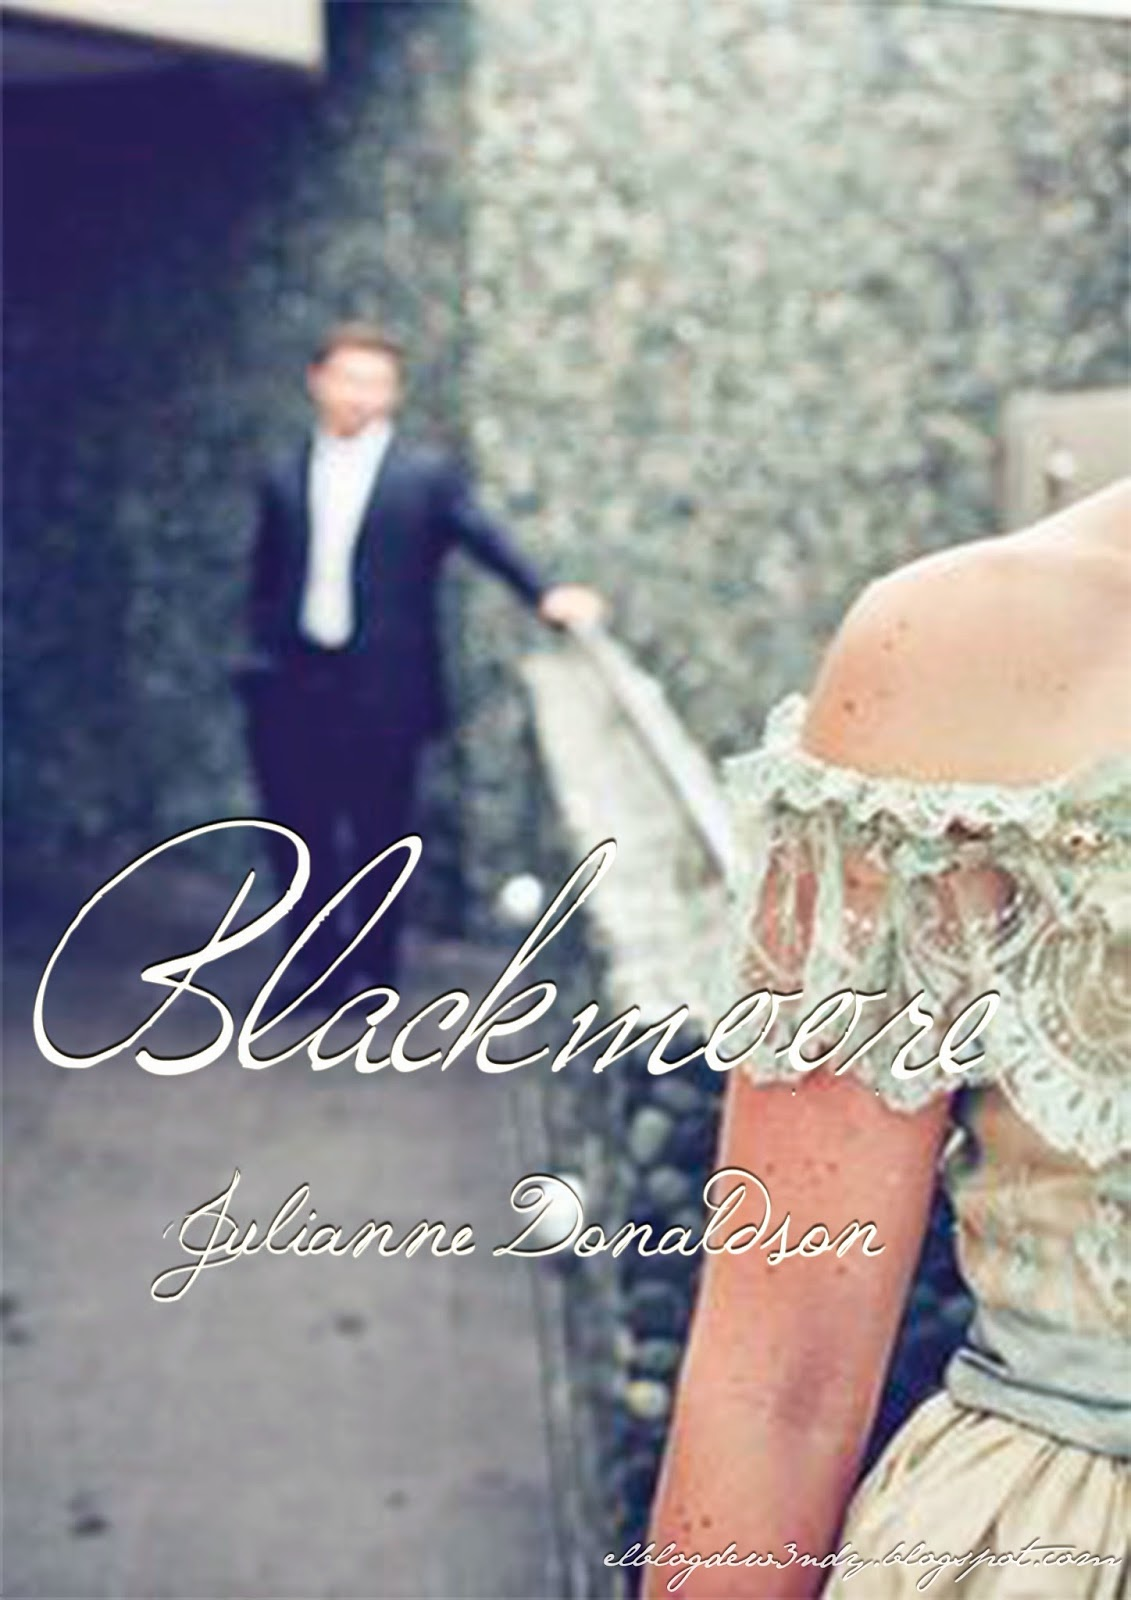 http://elblogdew3ndy.blogspot.com/2015/01/resena-blackmoore-julianne-donaldson.html